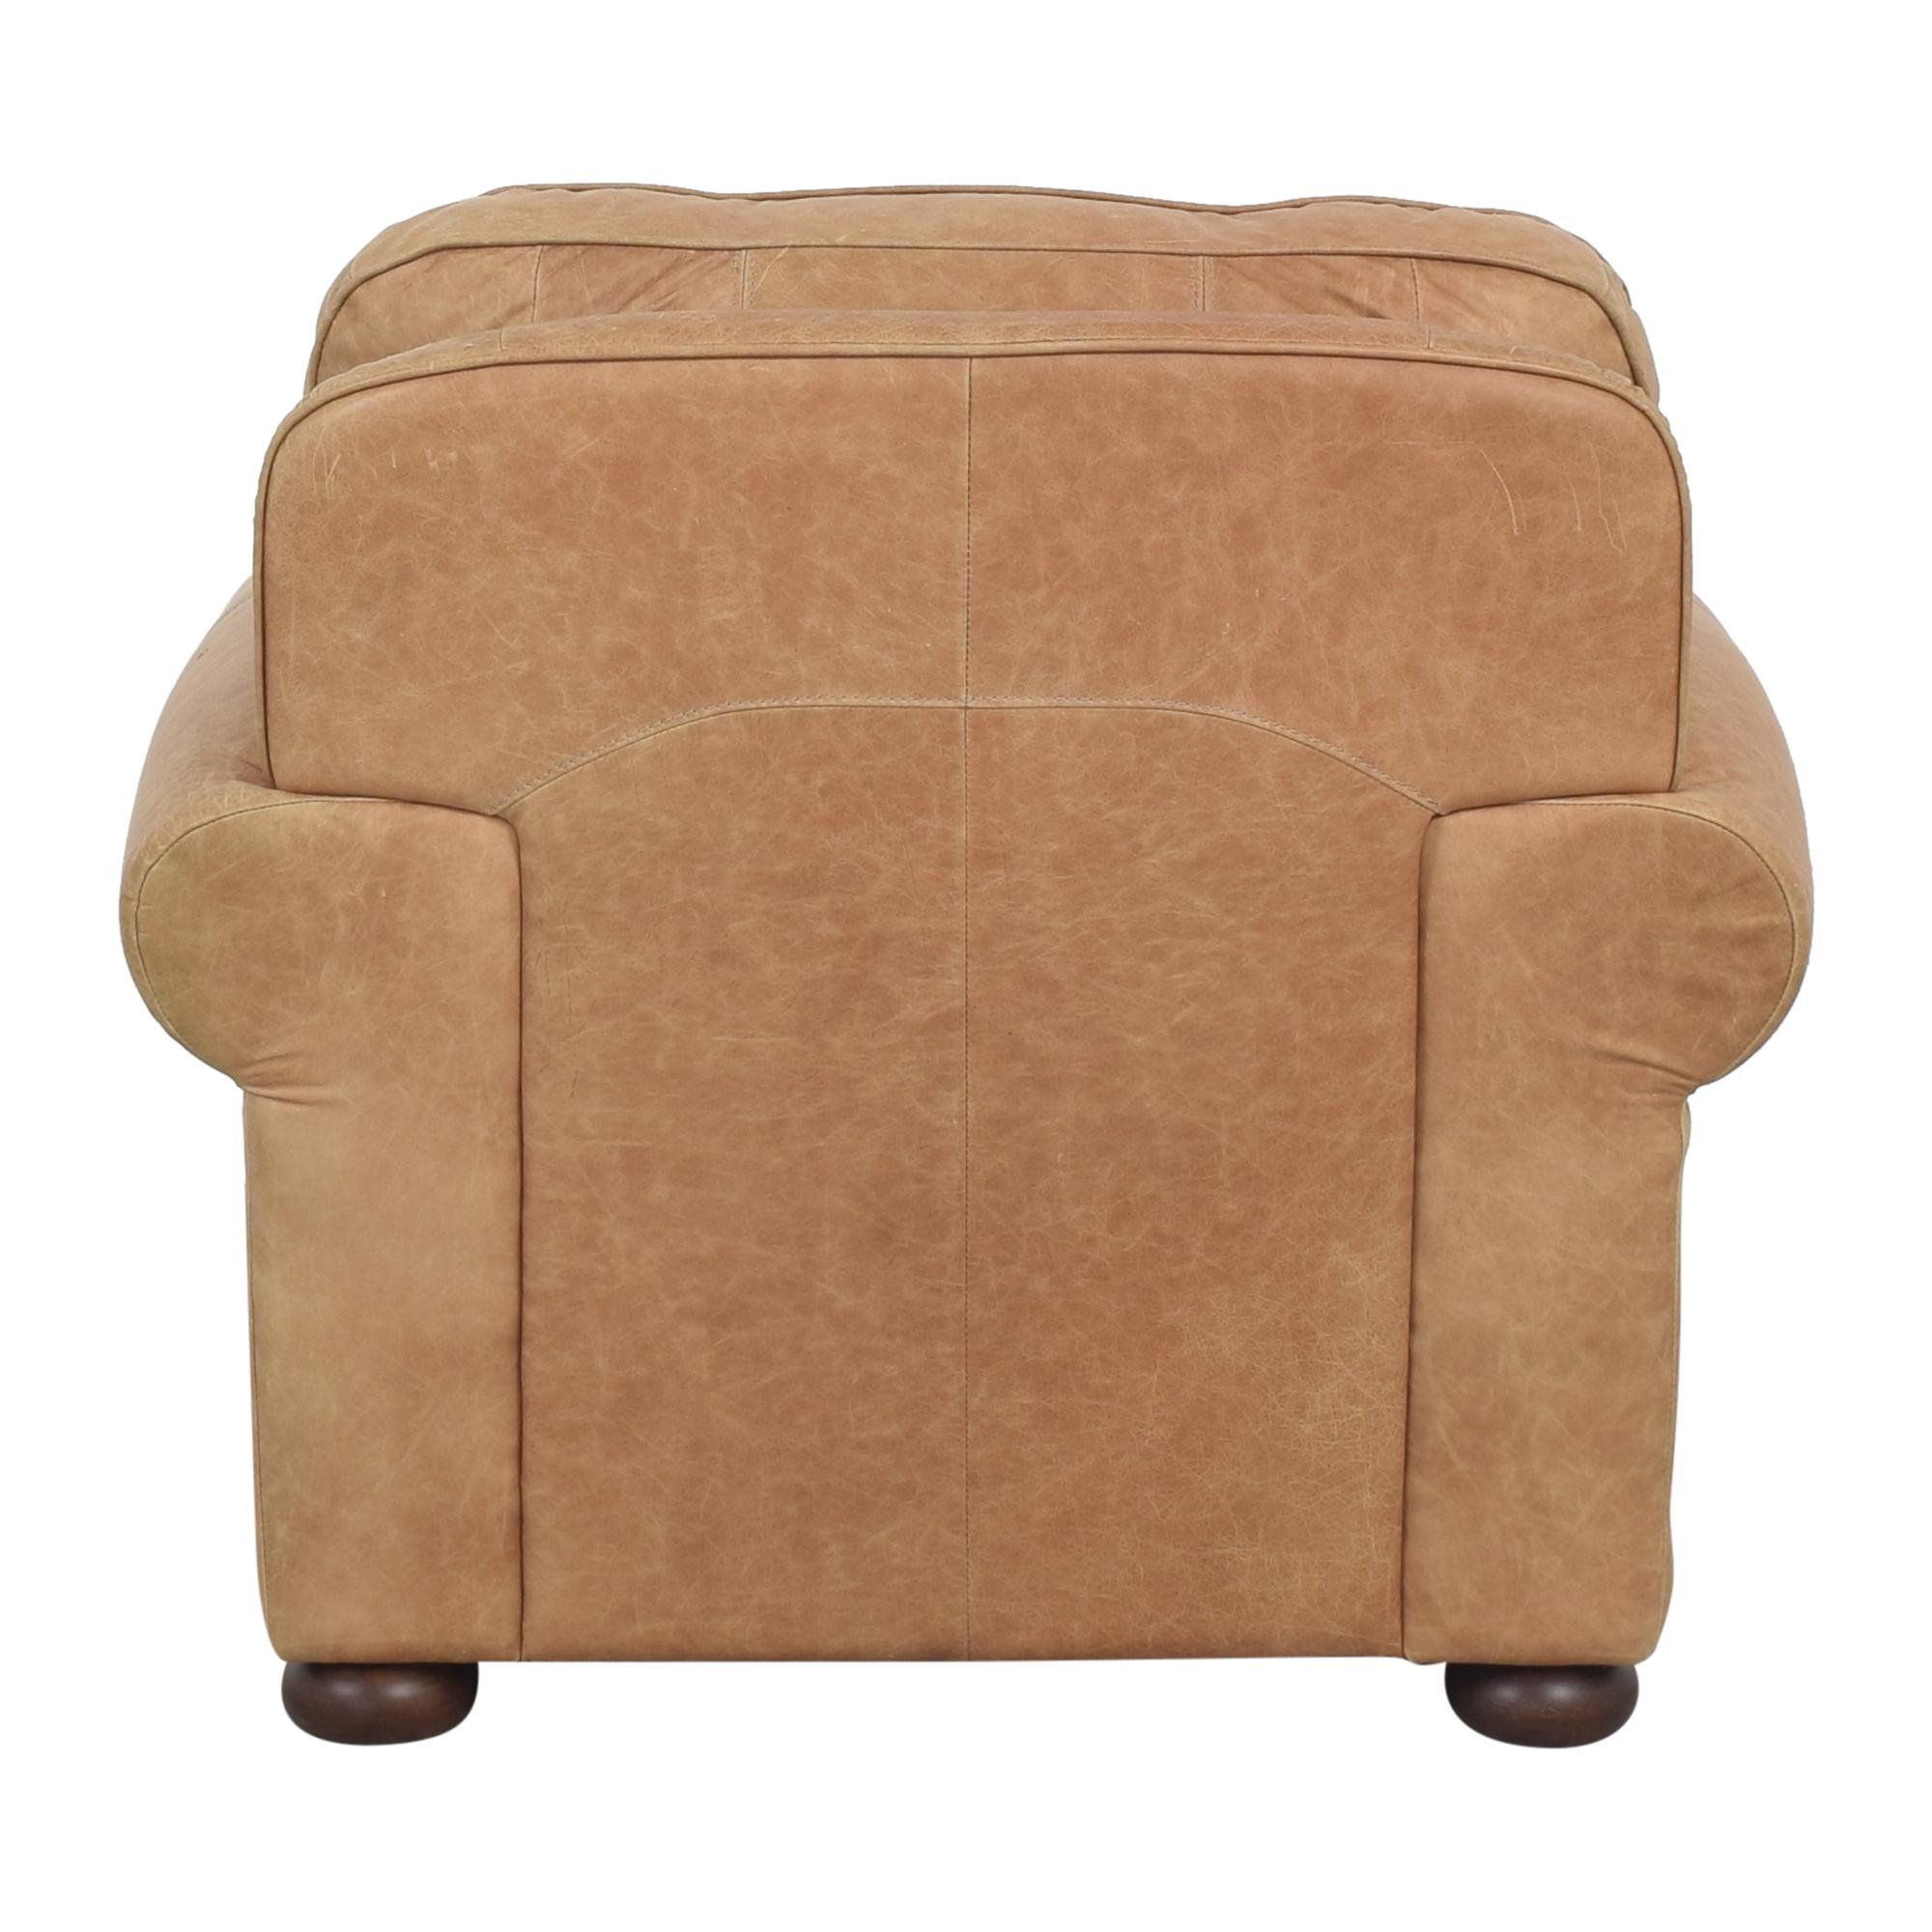 Ethan Allen Ethan Allen Roll Arm Chair with Ottoman dimensions